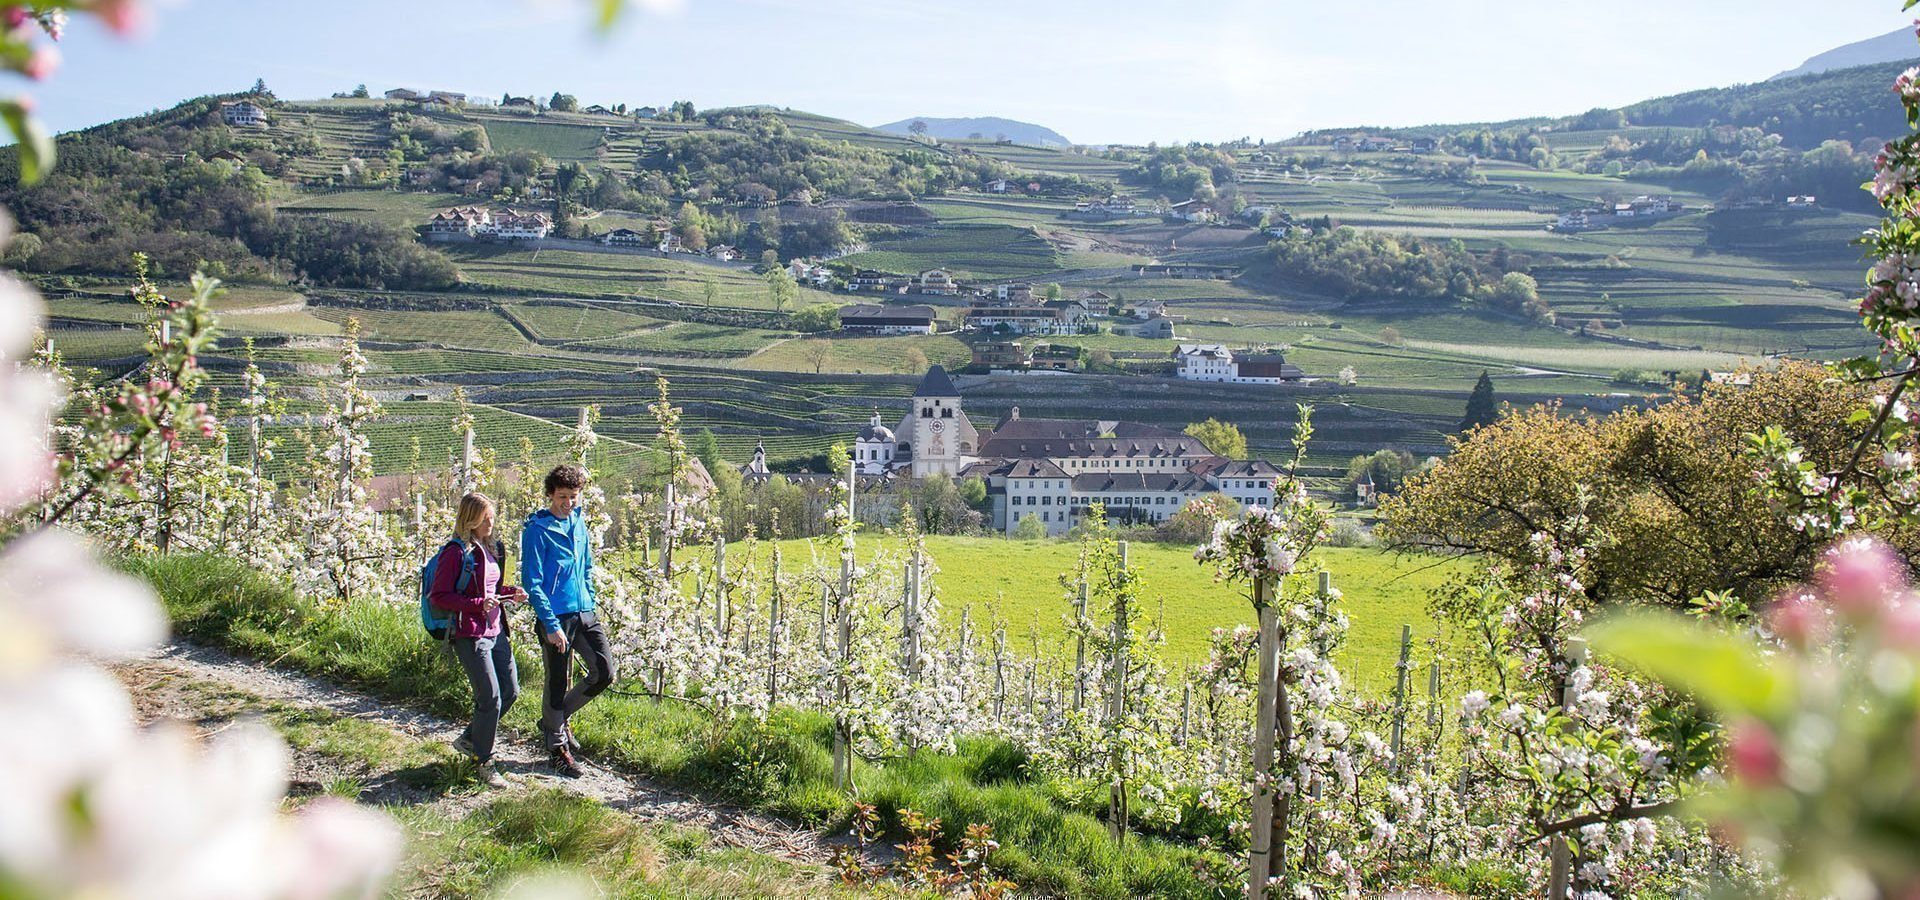 Frühlingsferien in Südtirol